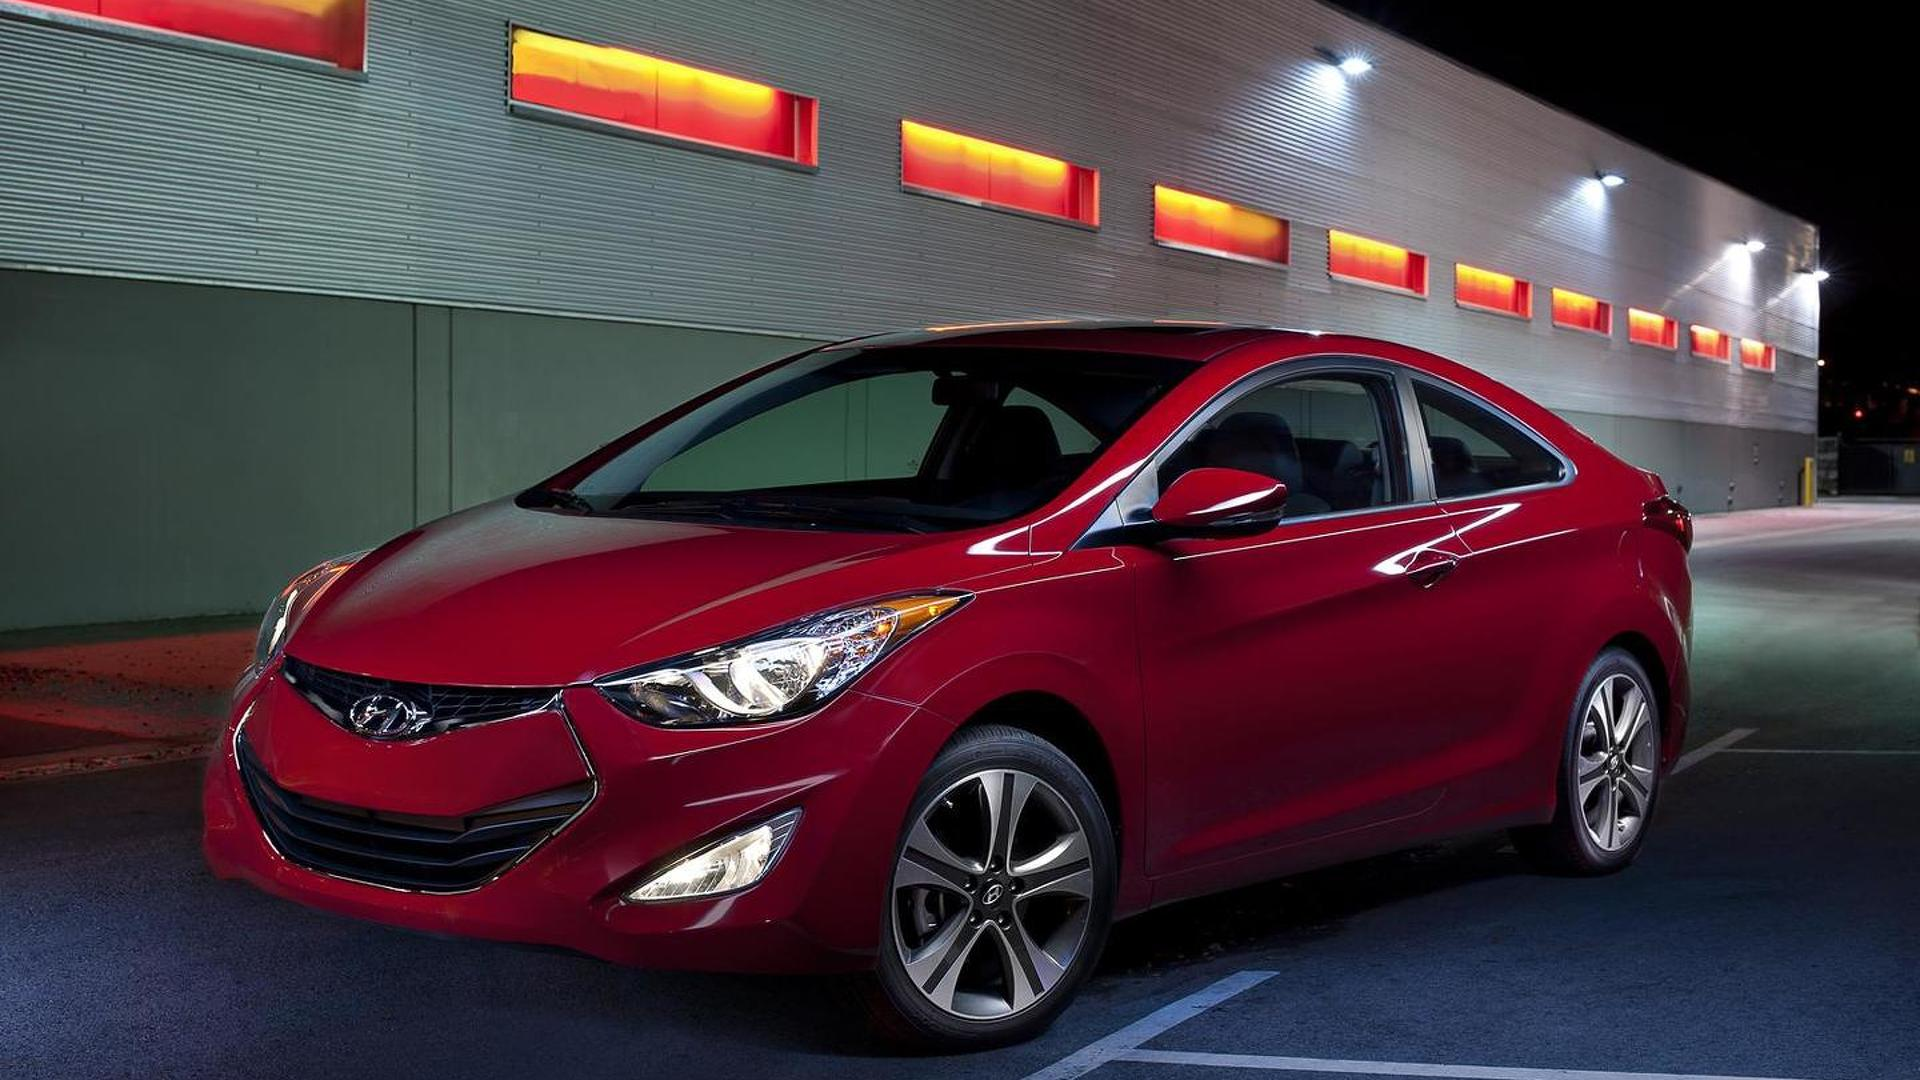 2013 Hyundai Elantra Coupe unveiled in Chicago